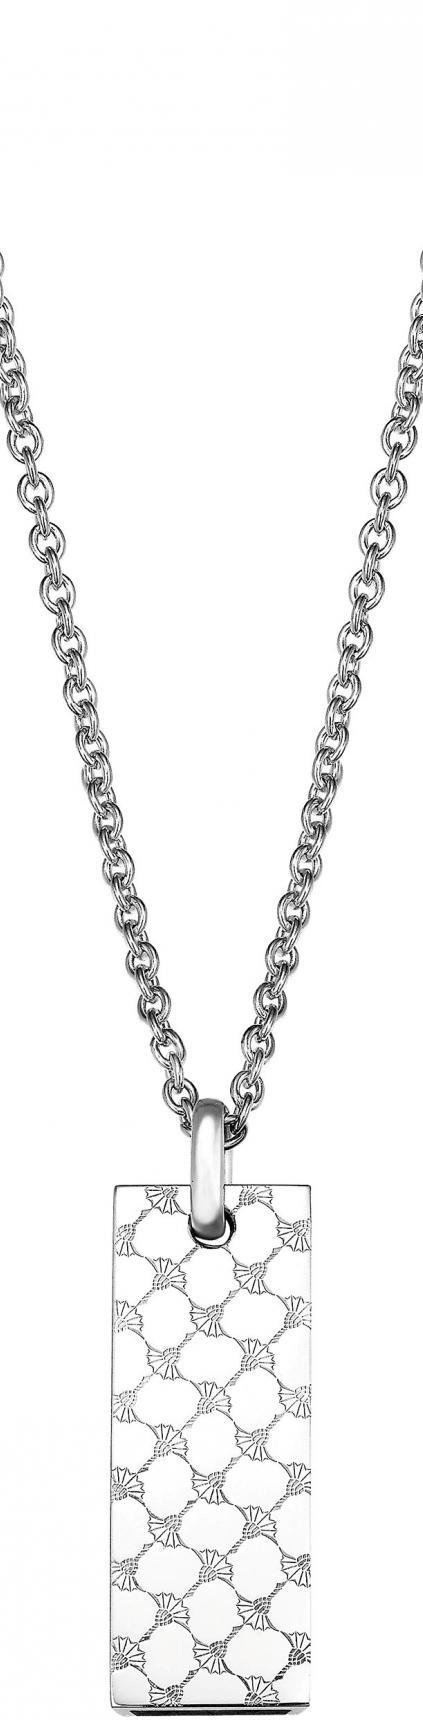 Joop! Jewelry Cornflower Signature JPNL90672A500 mens necklace Rhodanized Sterling Silver